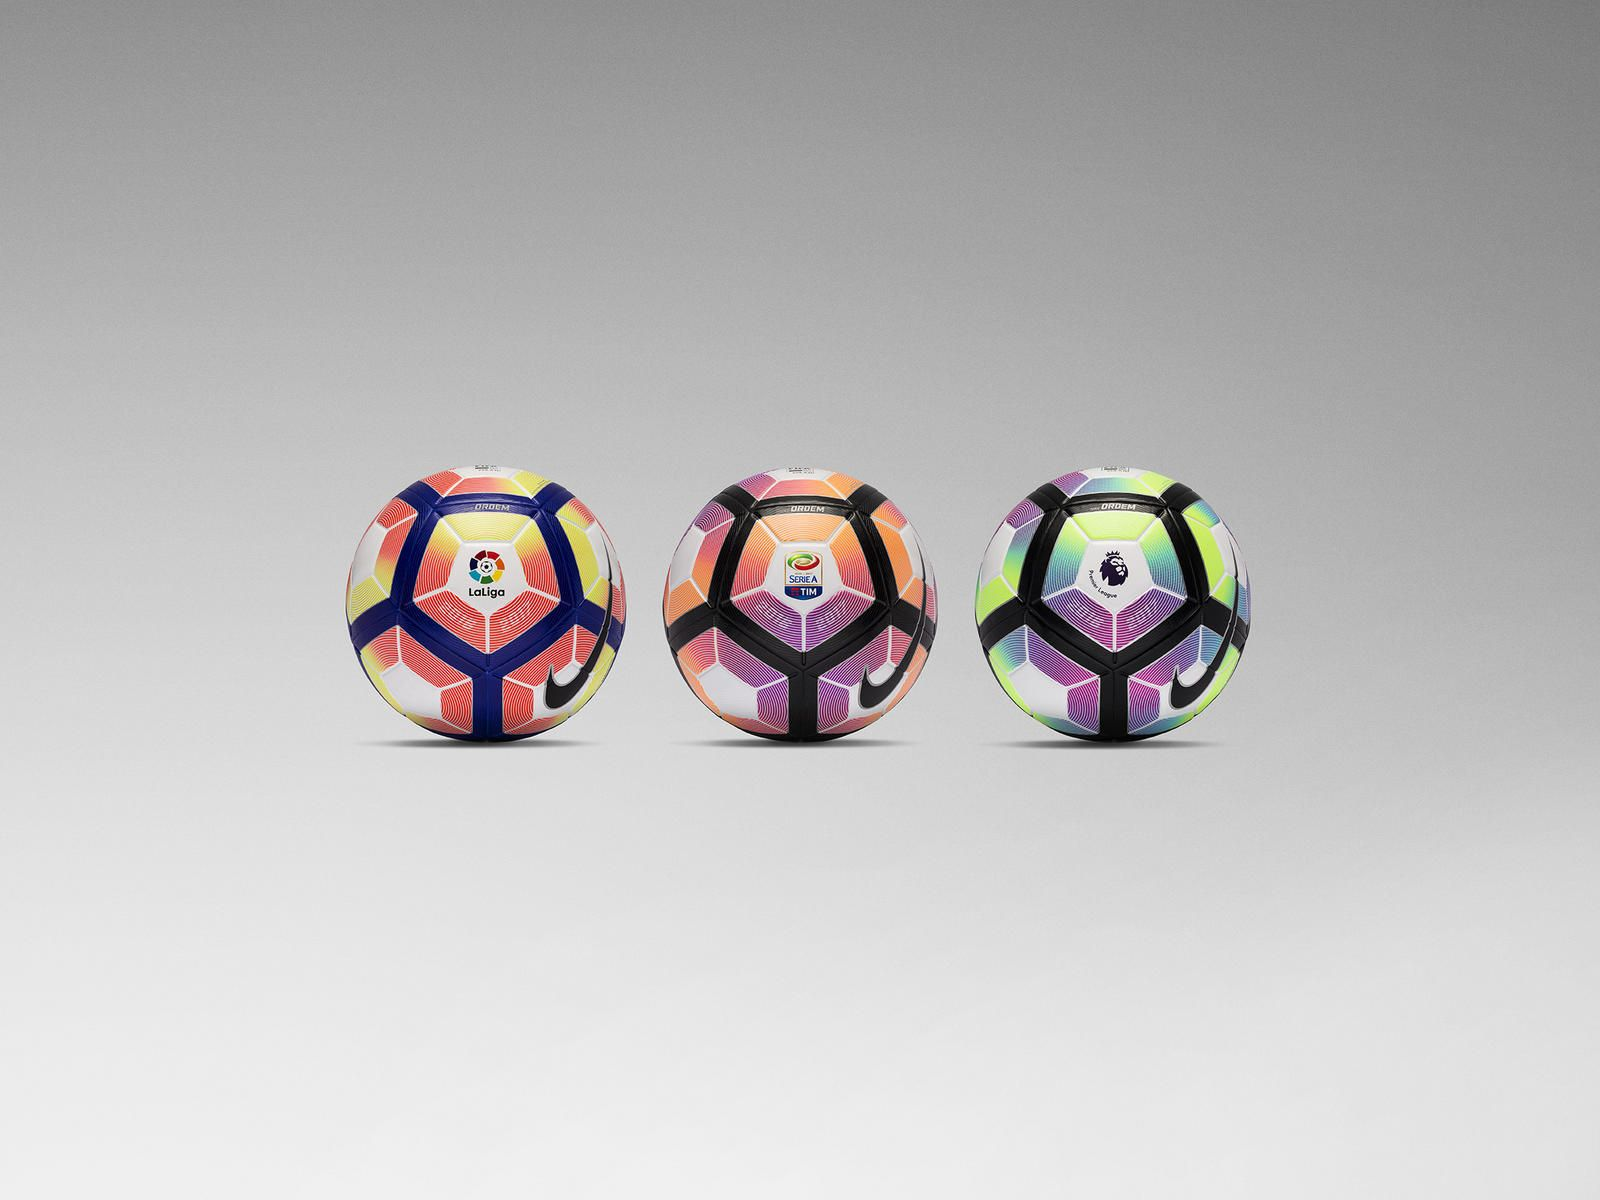 Обои nike, премьер-лига, football, Barclays premier league, мяч. Спорт foto 11